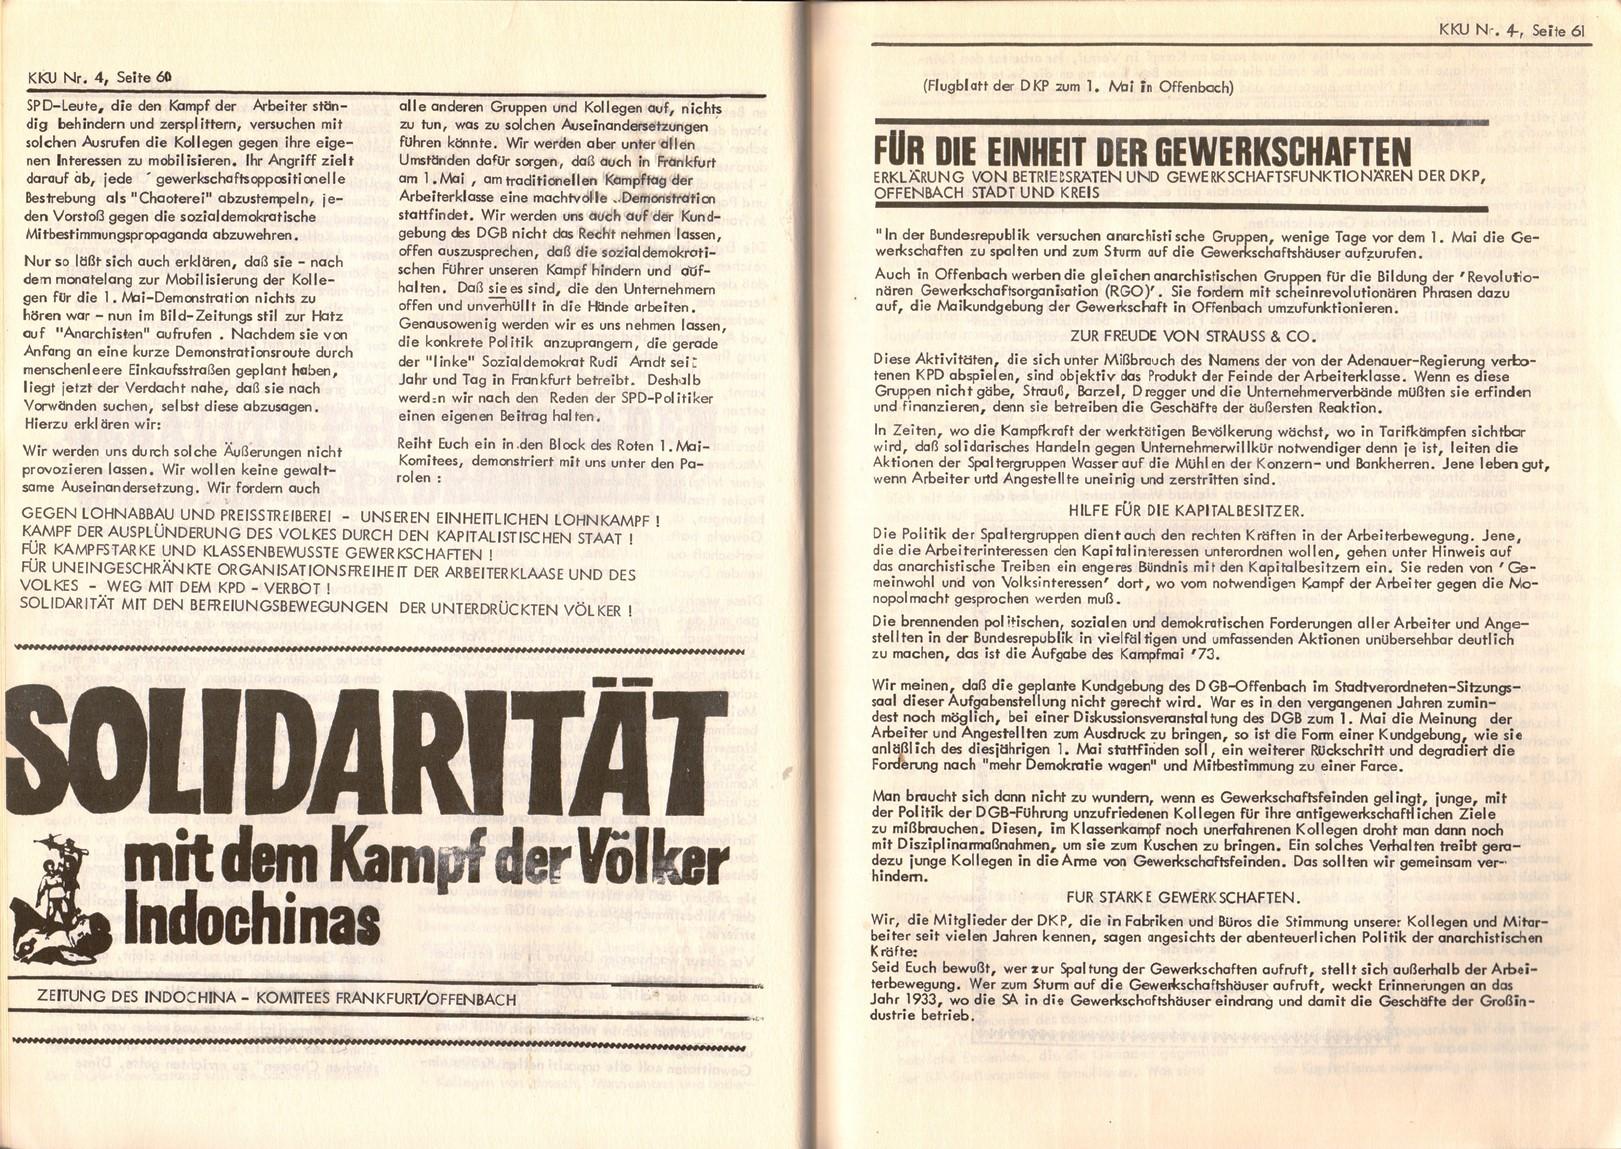 Frankfurt_Offenbach_KG_Kampf_Kritik_Umgestaltung_1973_04_05_31